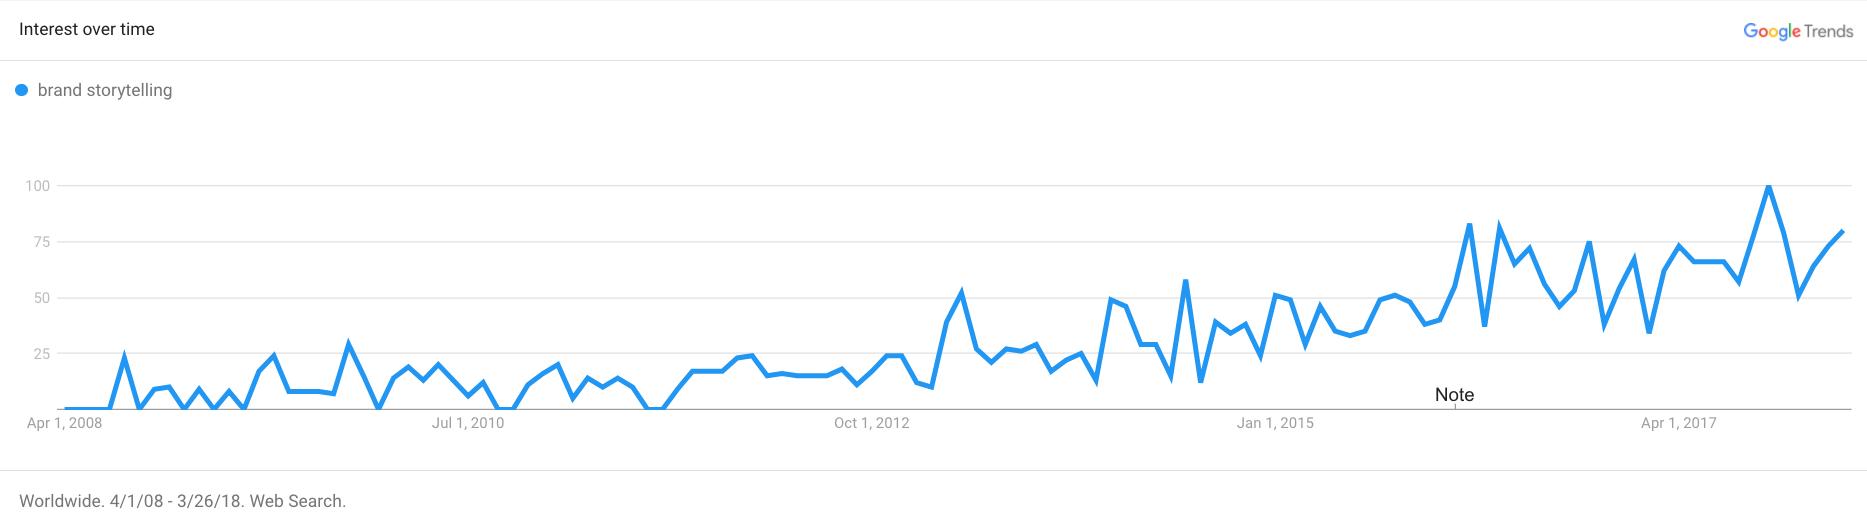 brand storytelling on Google Trends